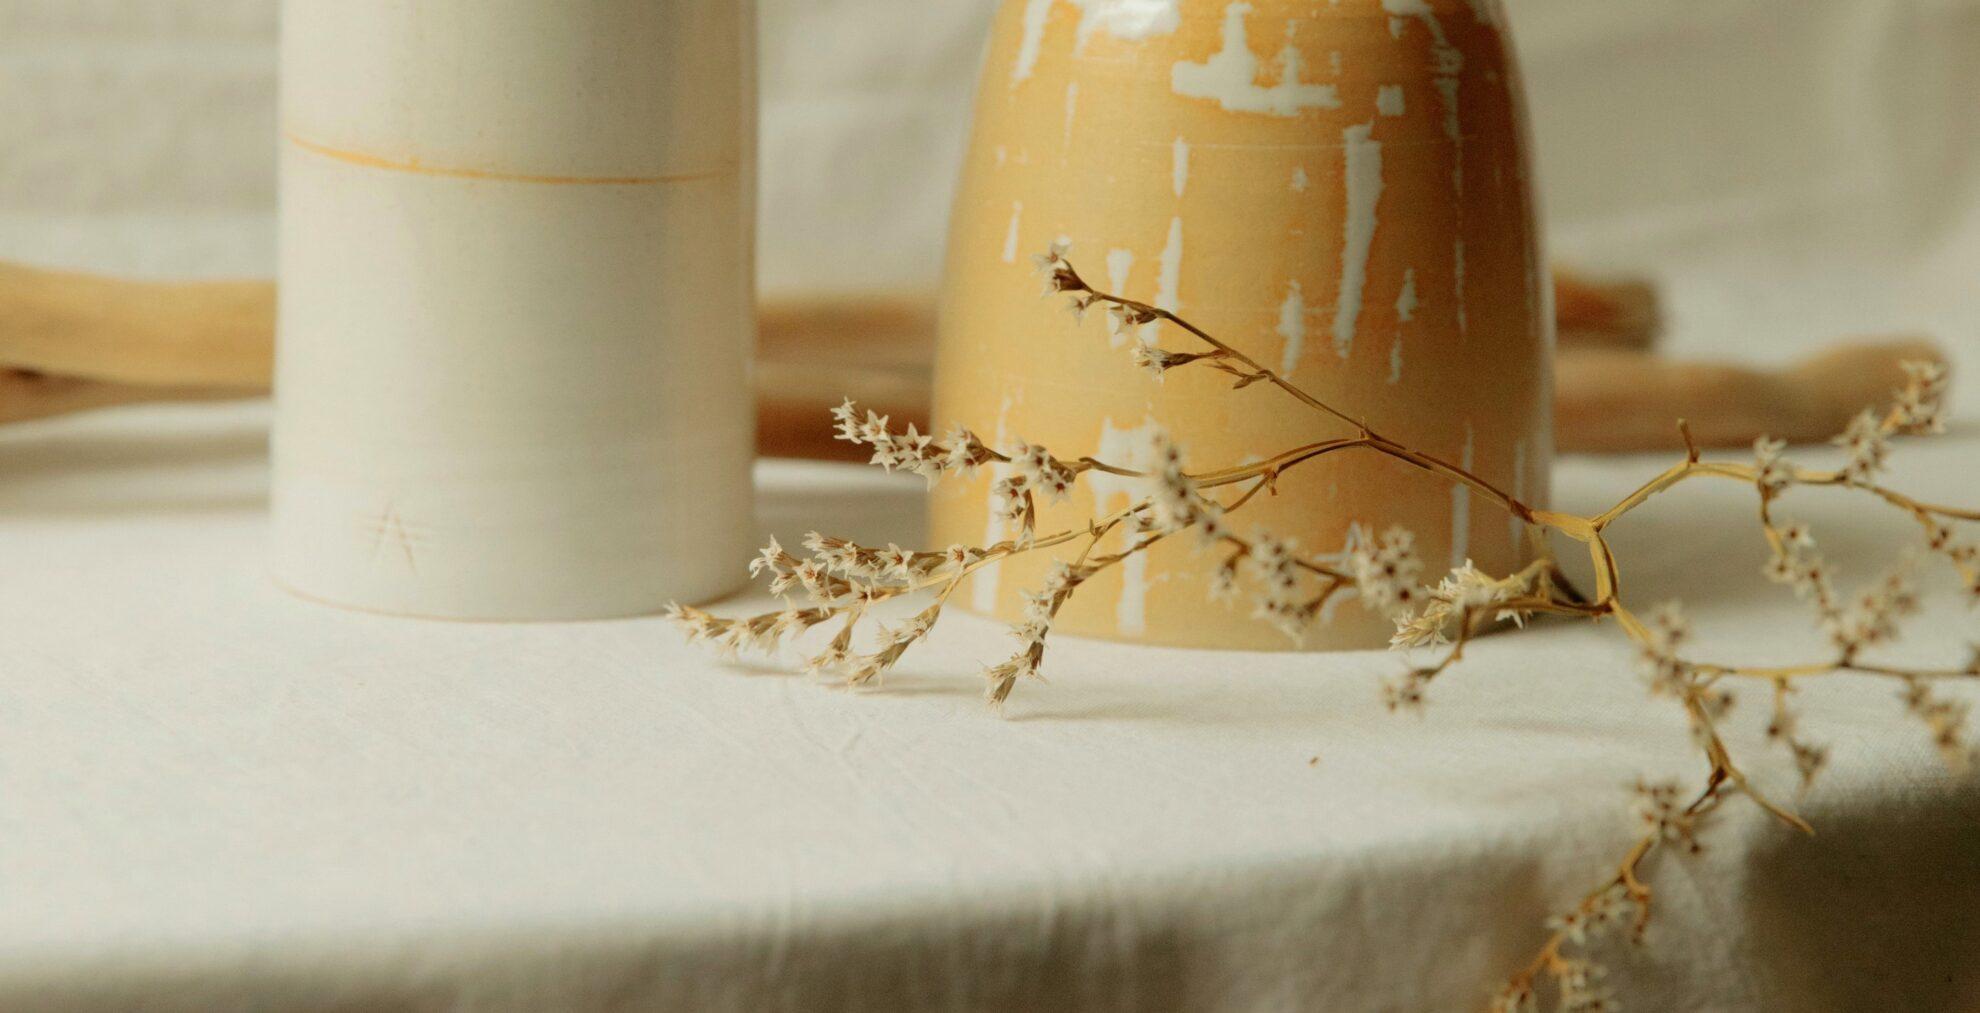 Vasen_2020_5_Hodges_Ceramics_MHaenggi_photography_JHunn